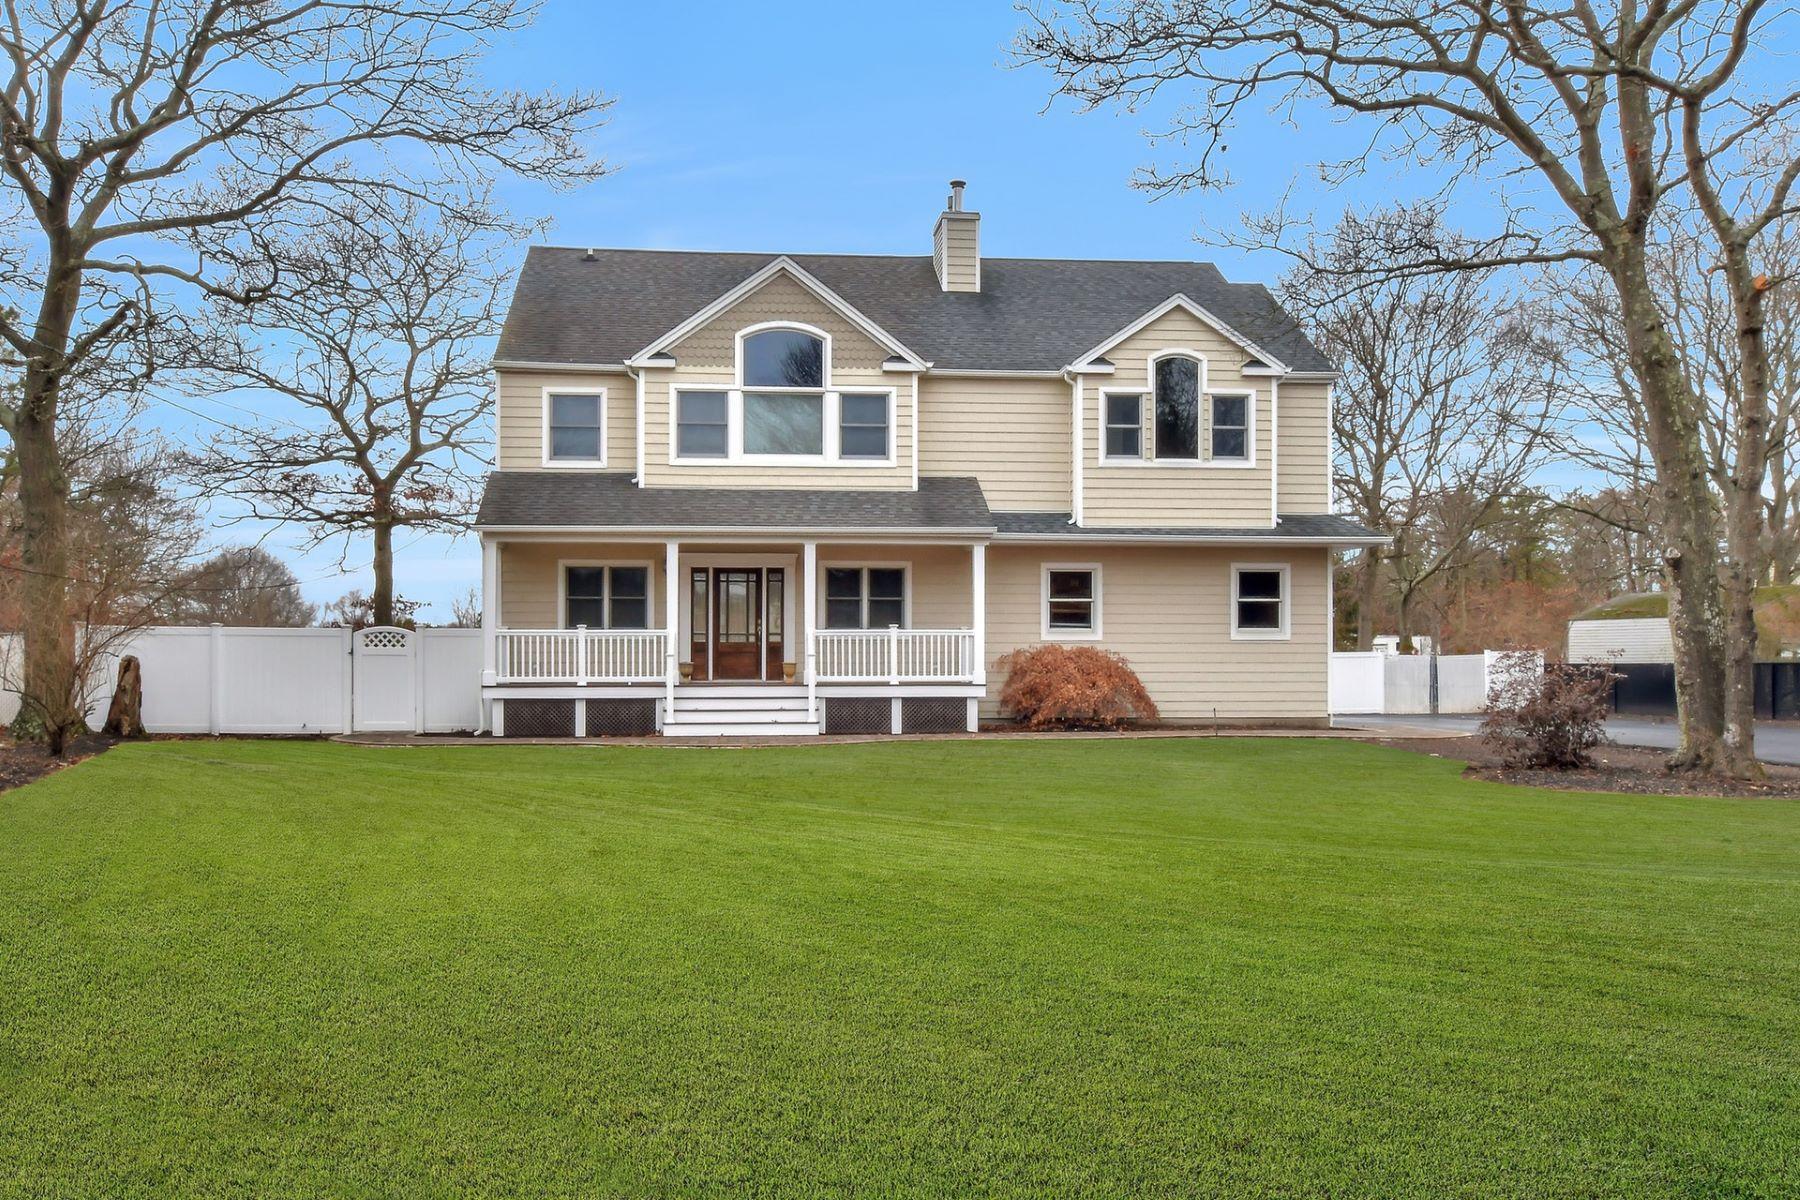 Single Family Homes for Active at Medford 16 Fairmont Ave Medford, New York 11763 United States